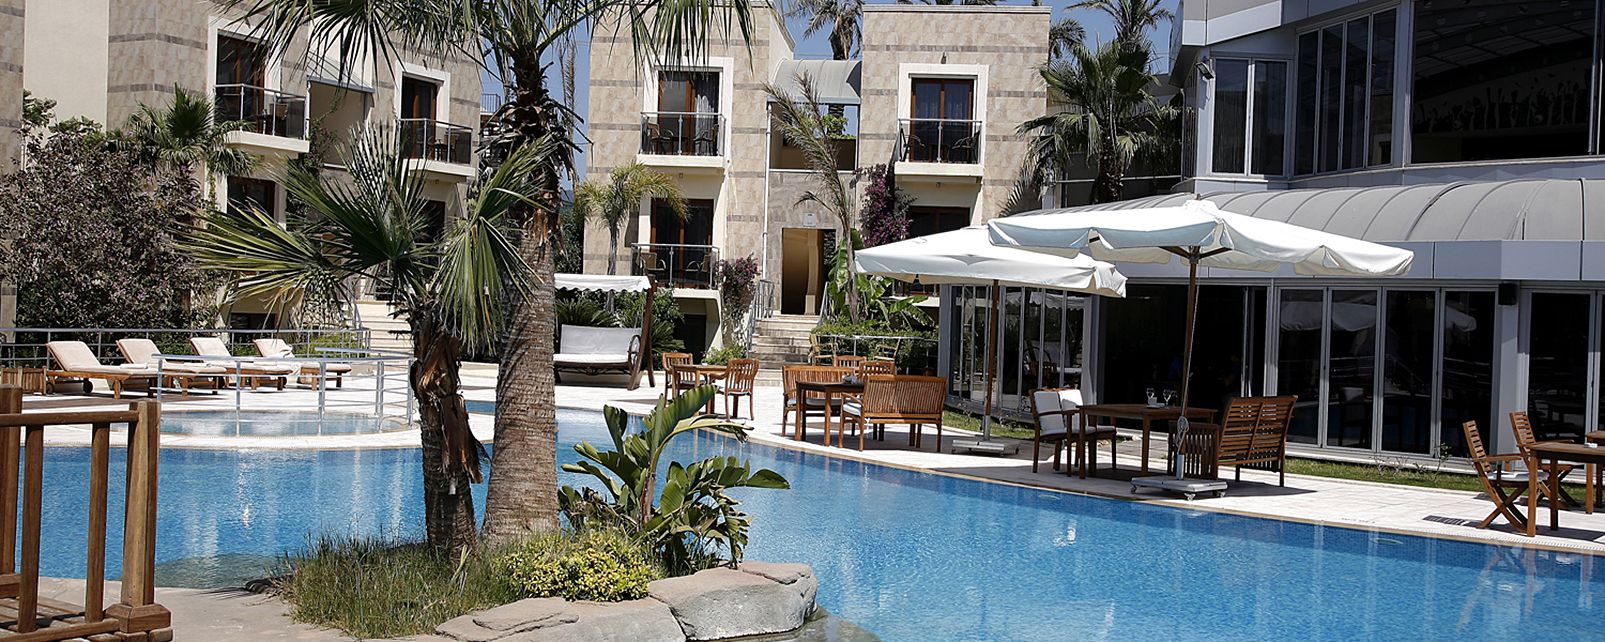 Hotel Bodrium Boutique Resort and Spa